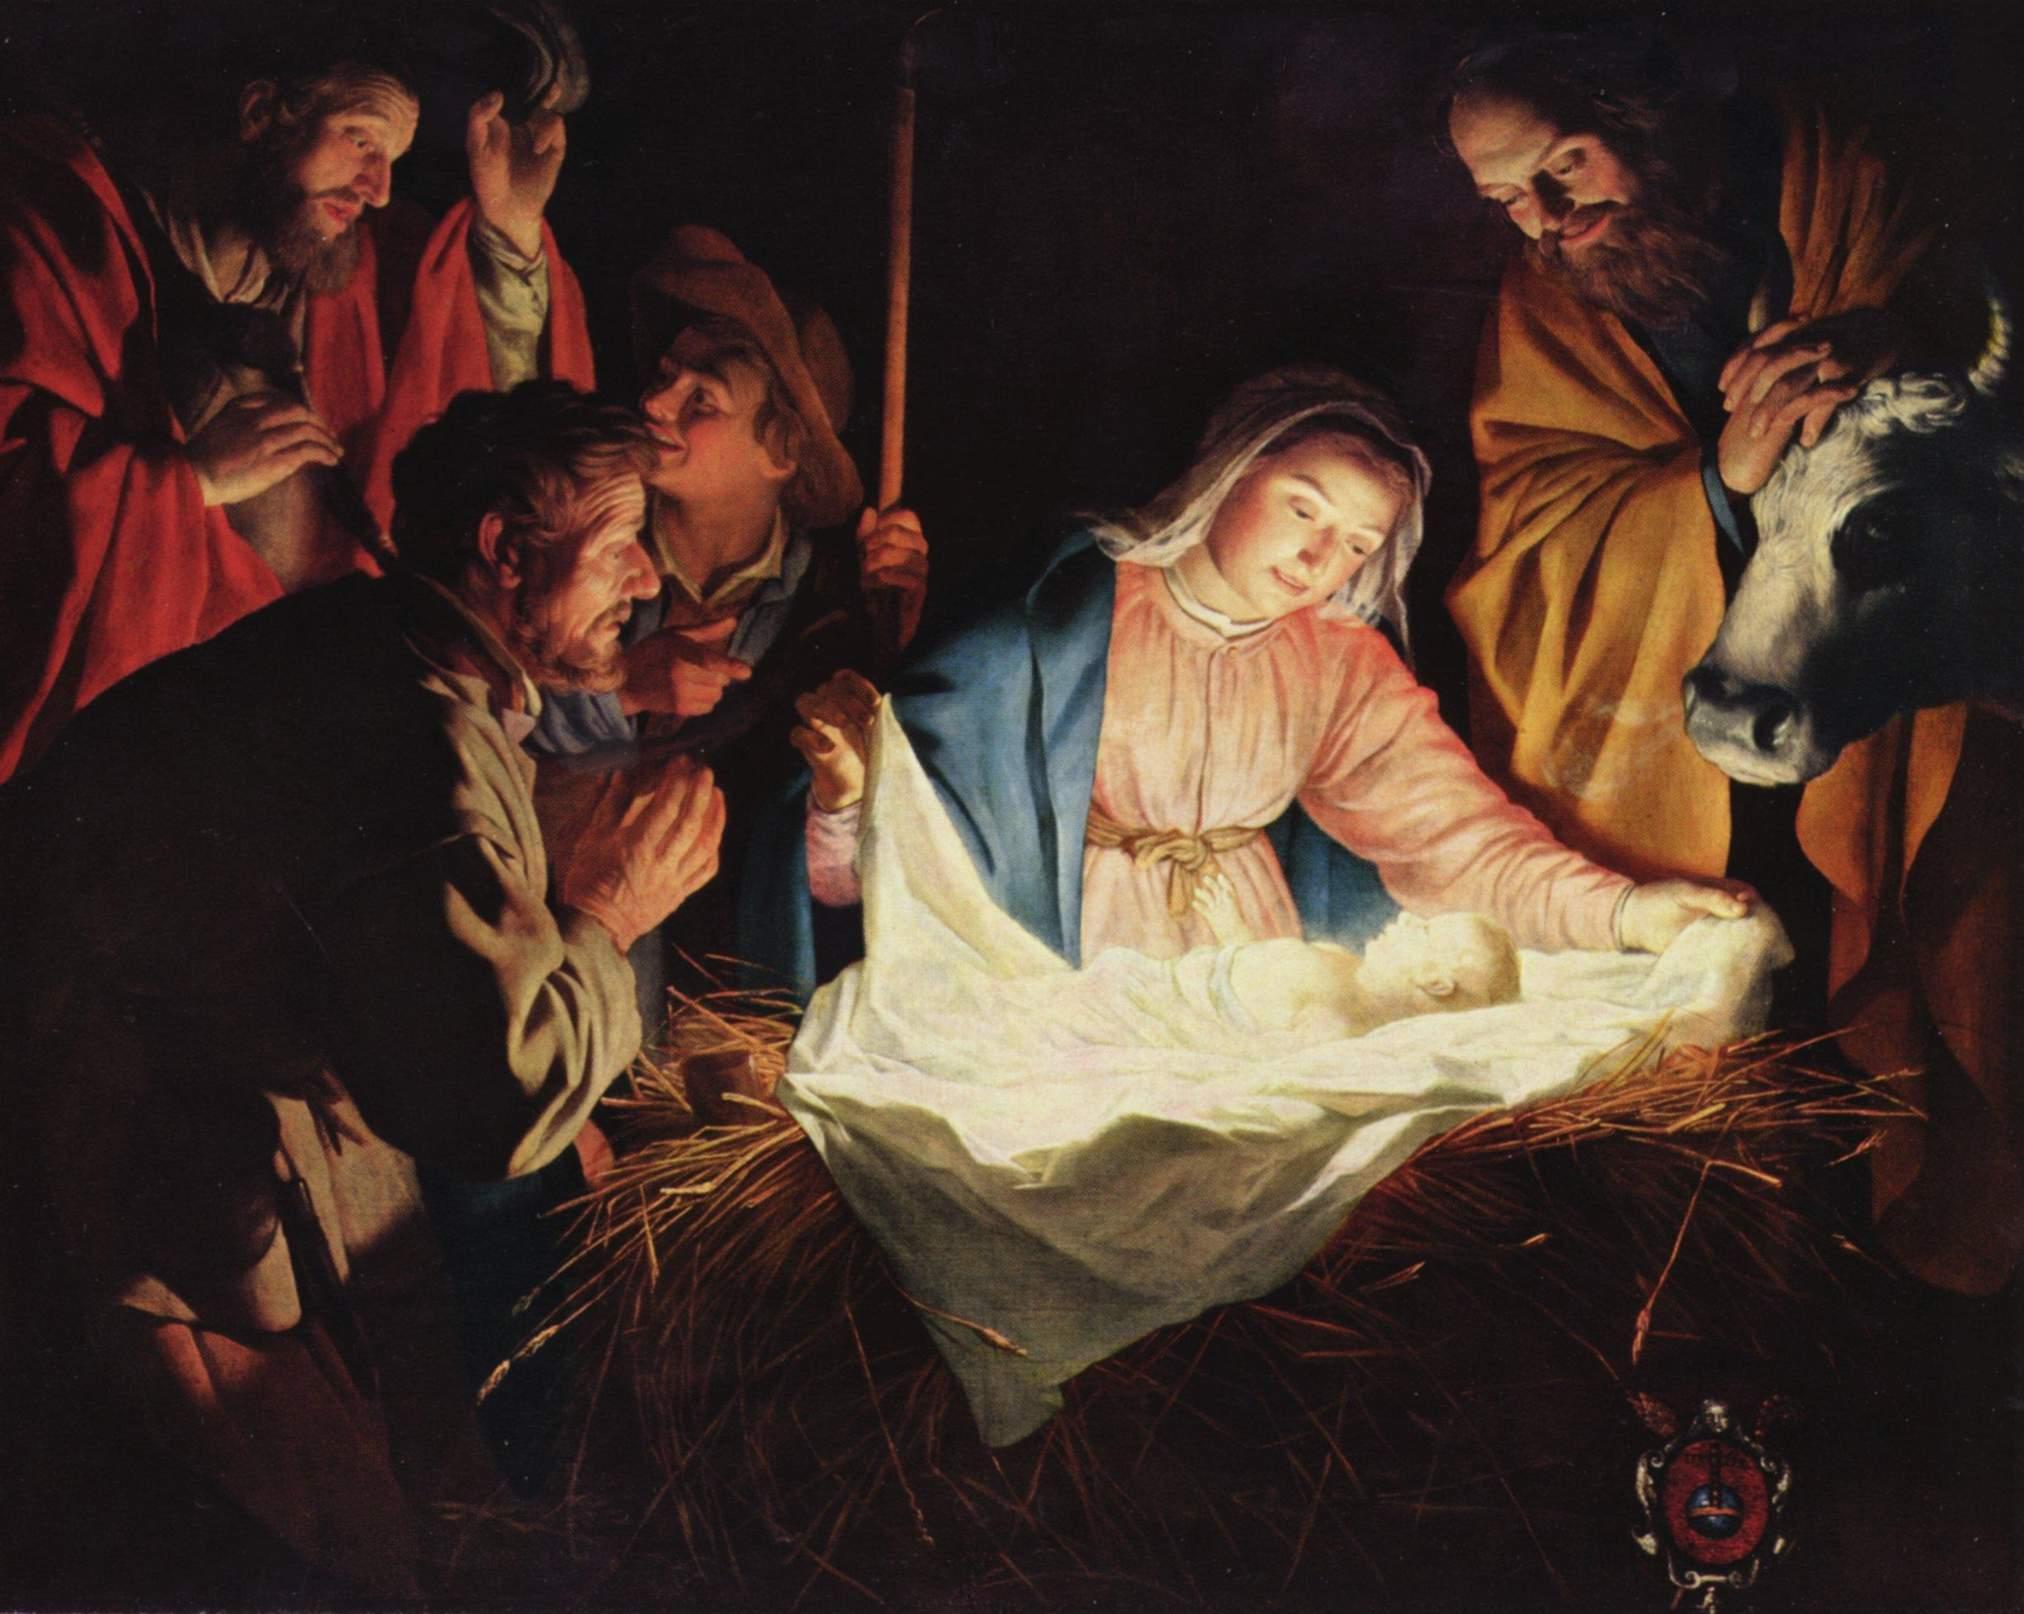 Adoration of the Sheperds by Gerard van Honthorst